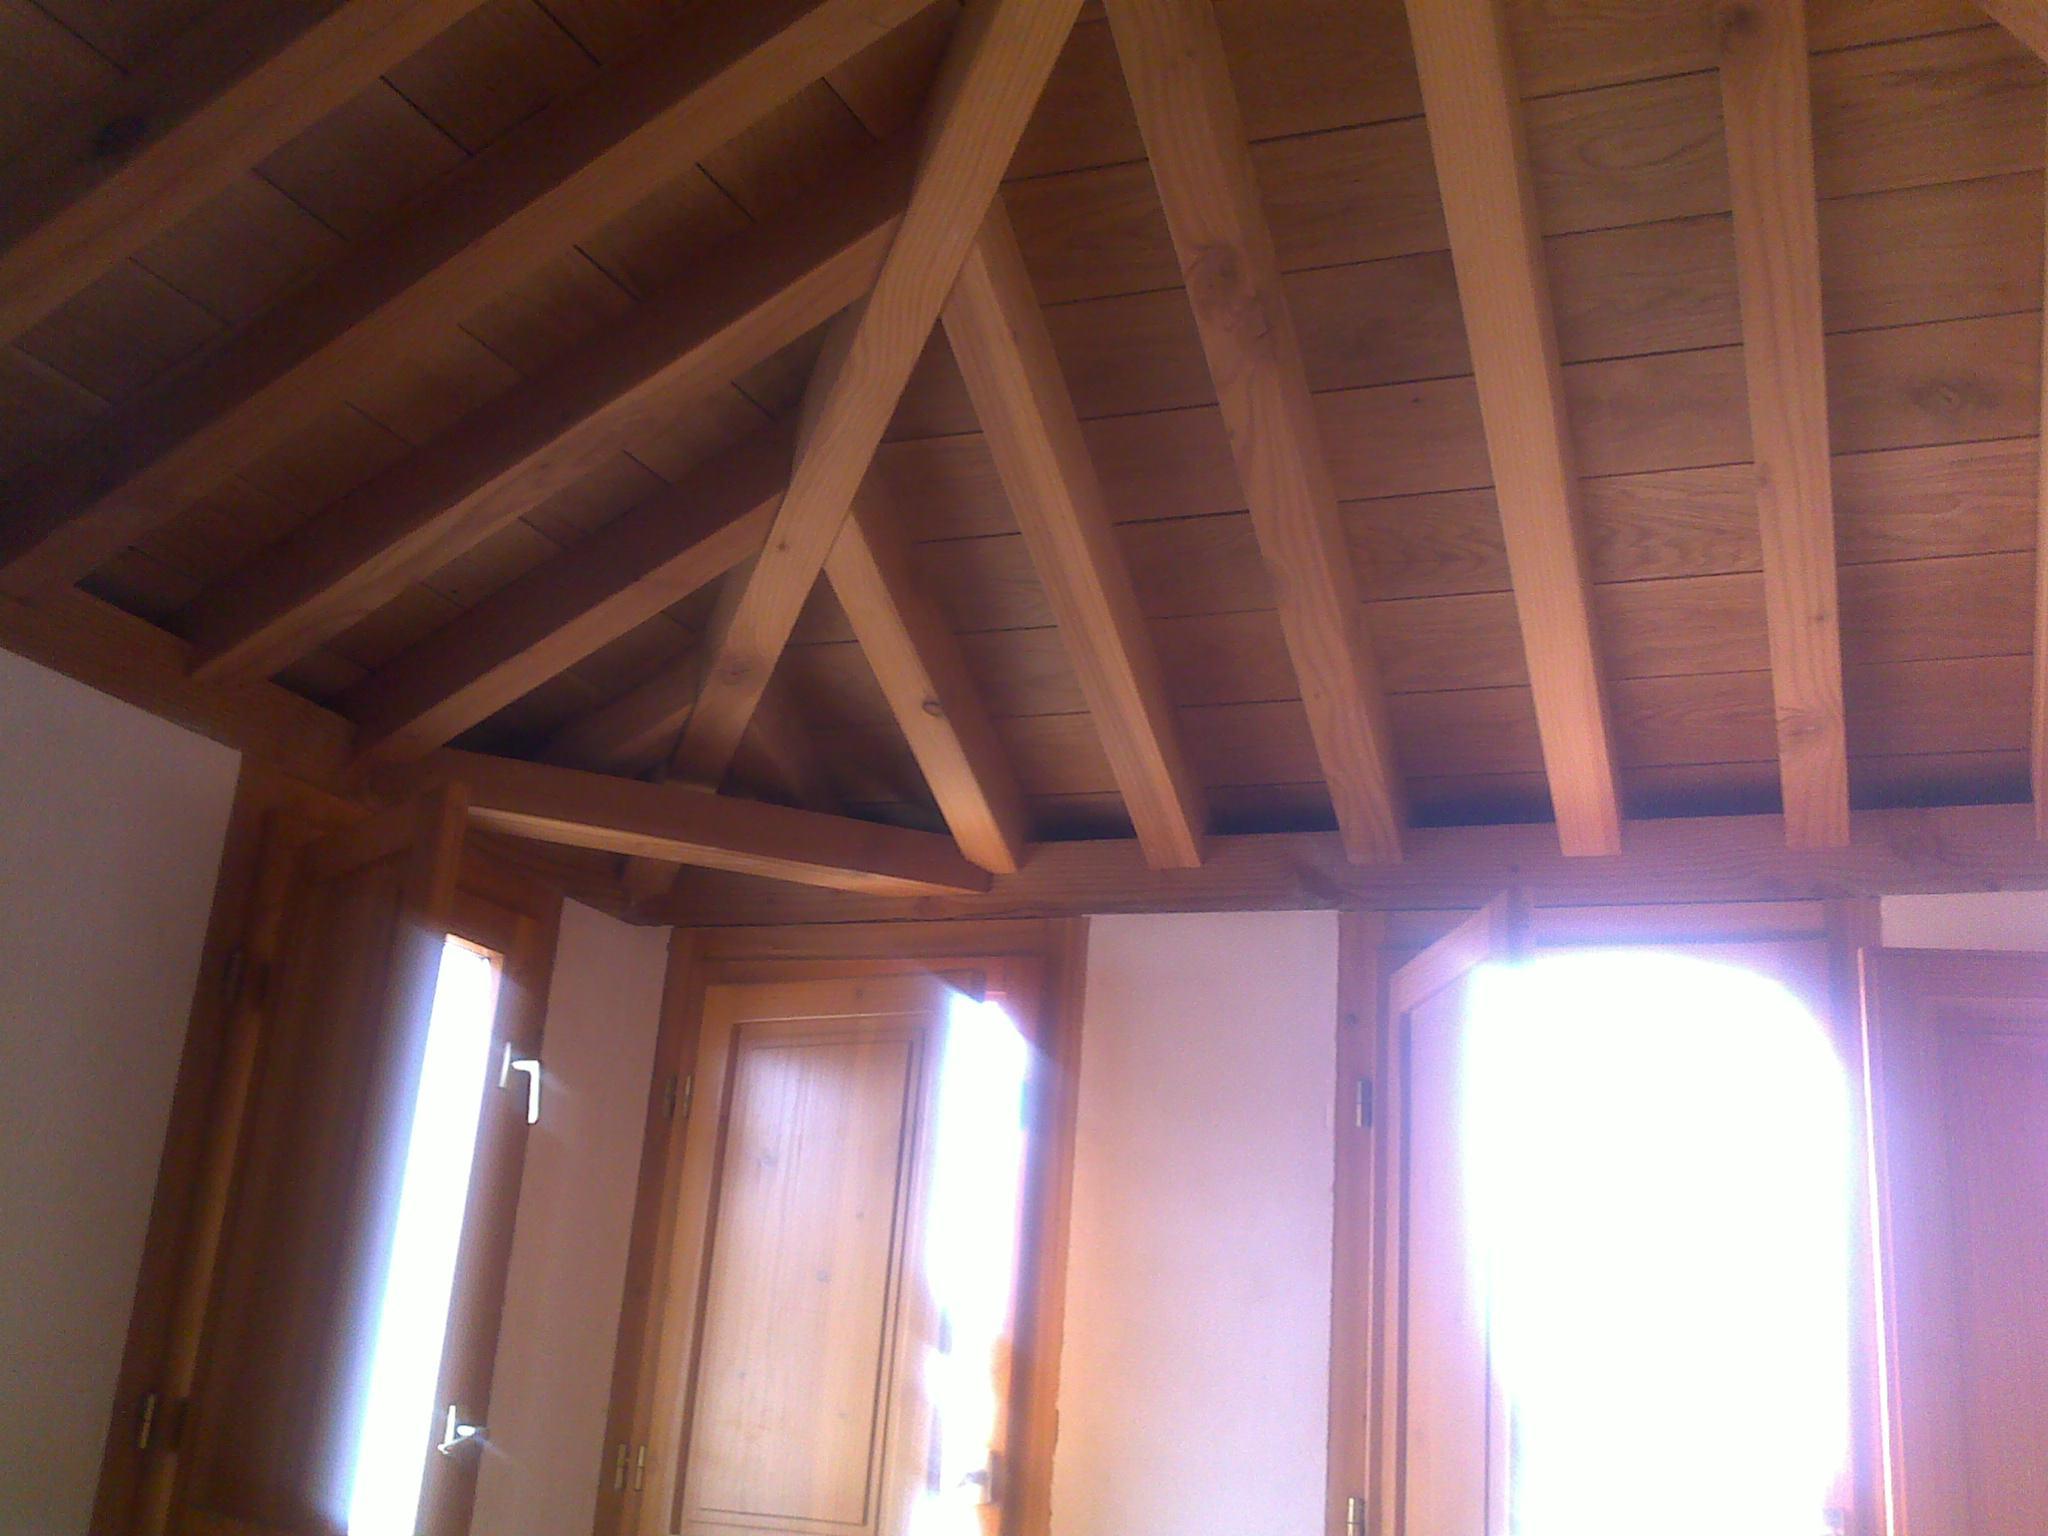 Movidecor 2002 sl techos de madera para buhardilla - Buhardillas de madera ...